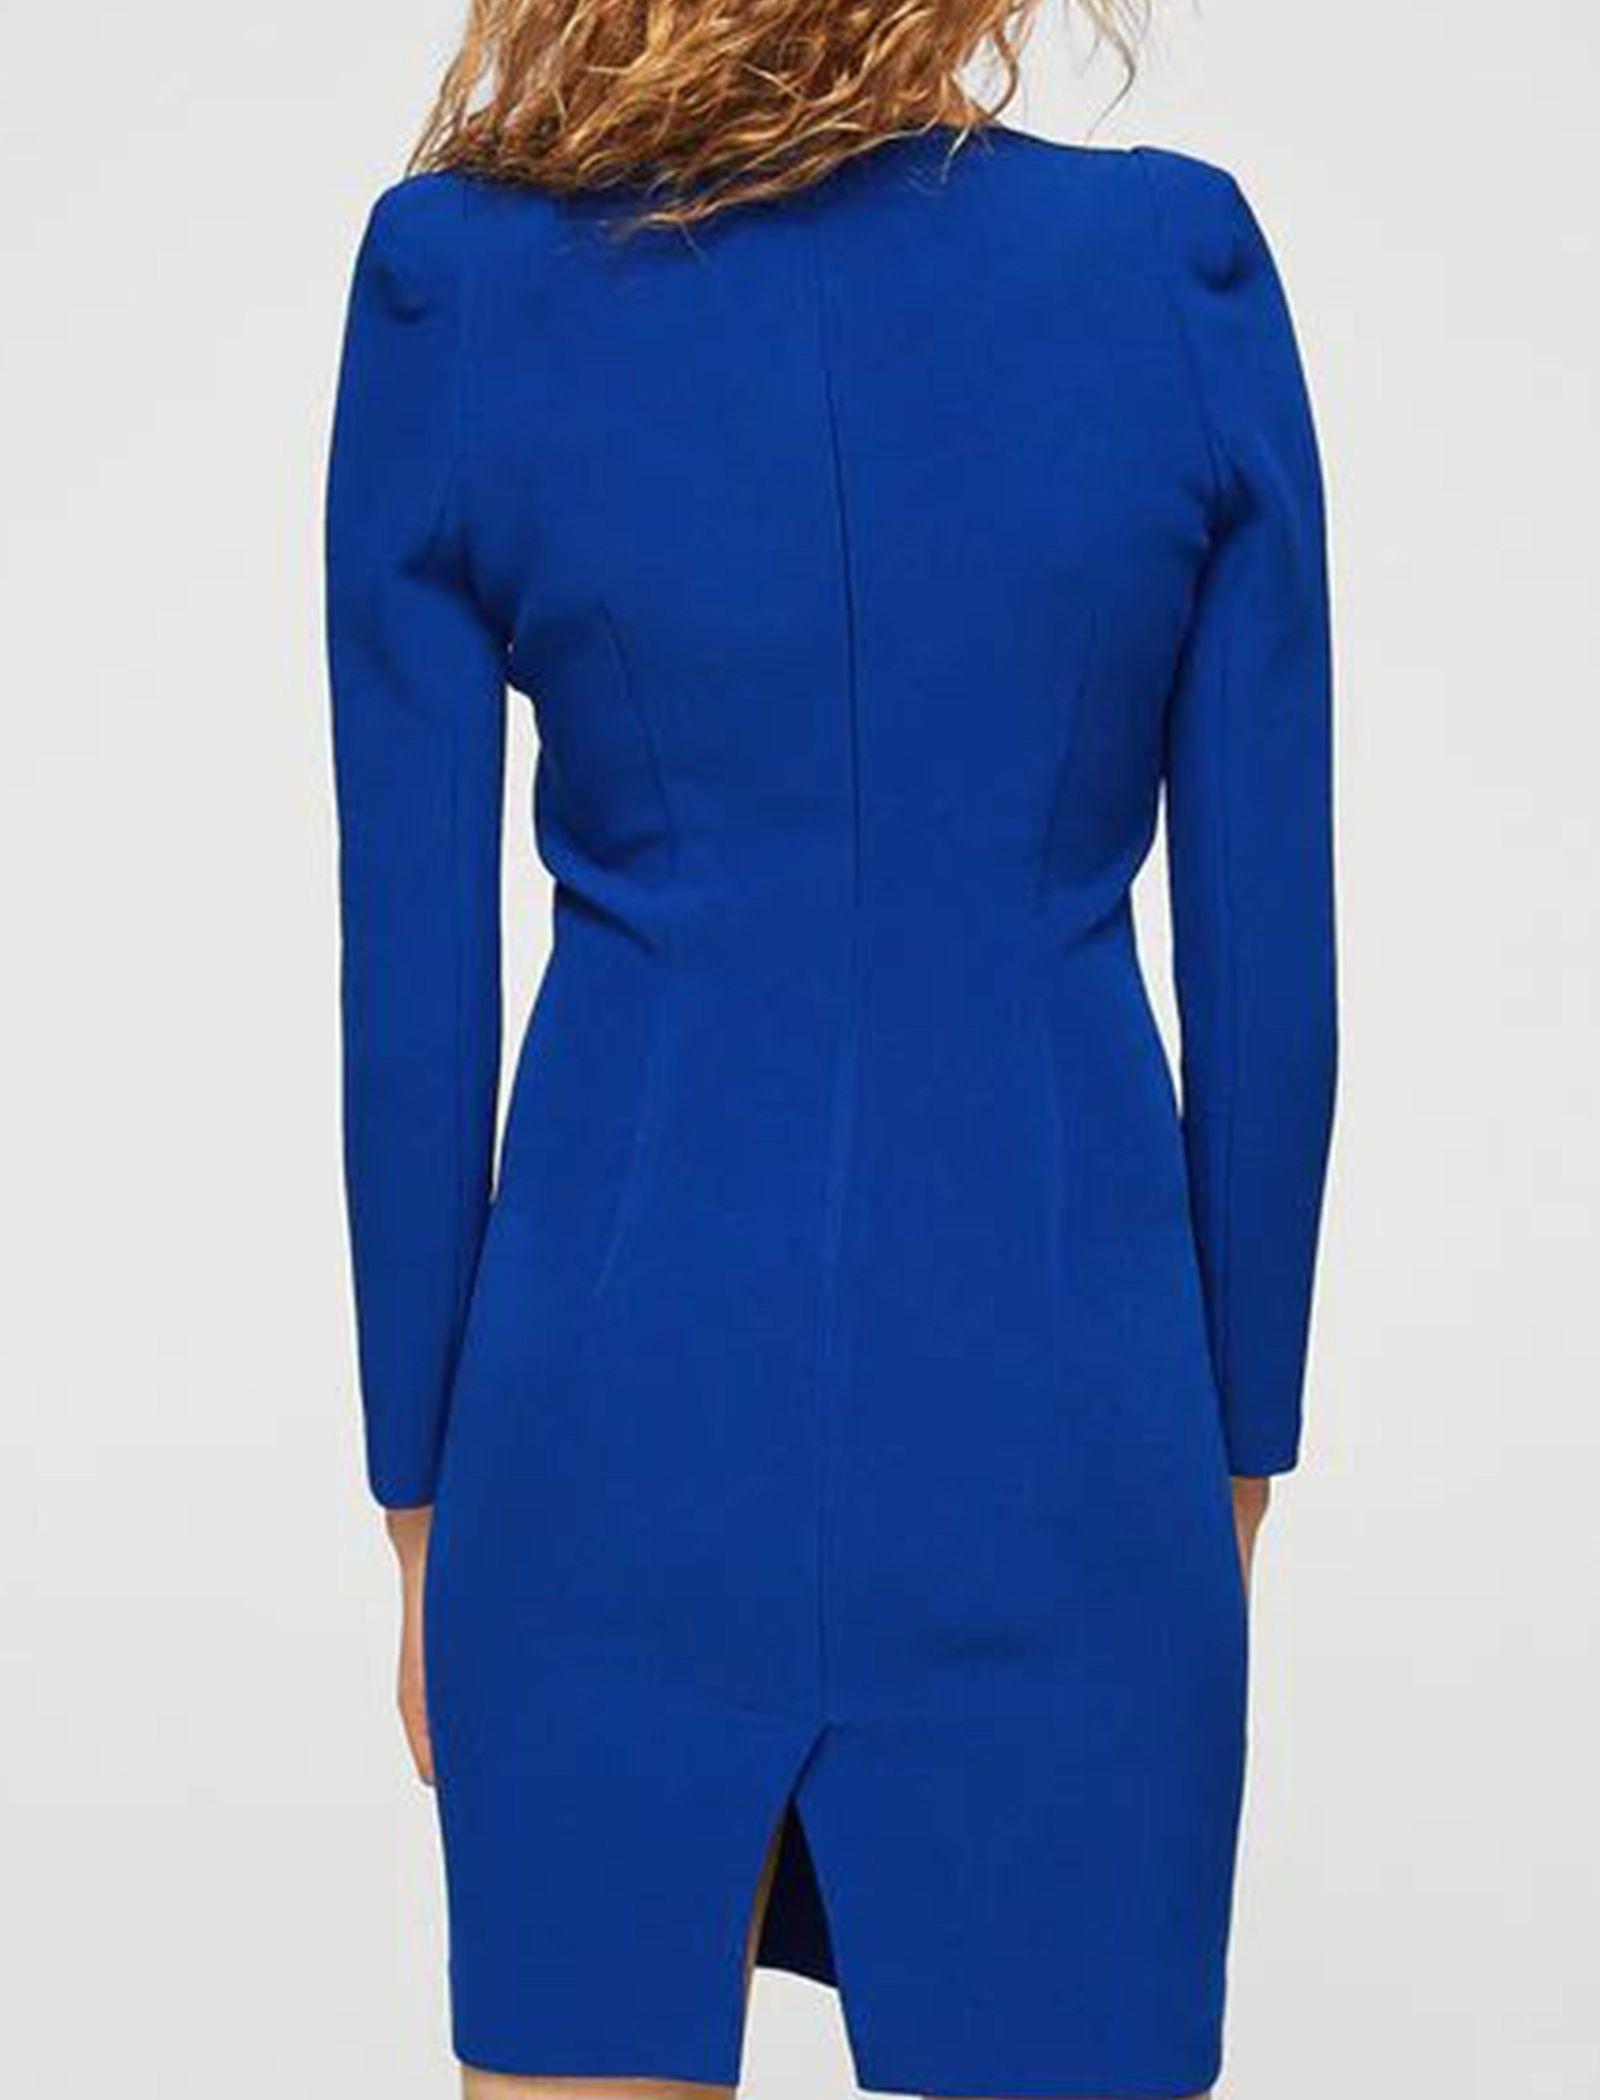 Woman Mini Dress - مانگو - آبي - 3